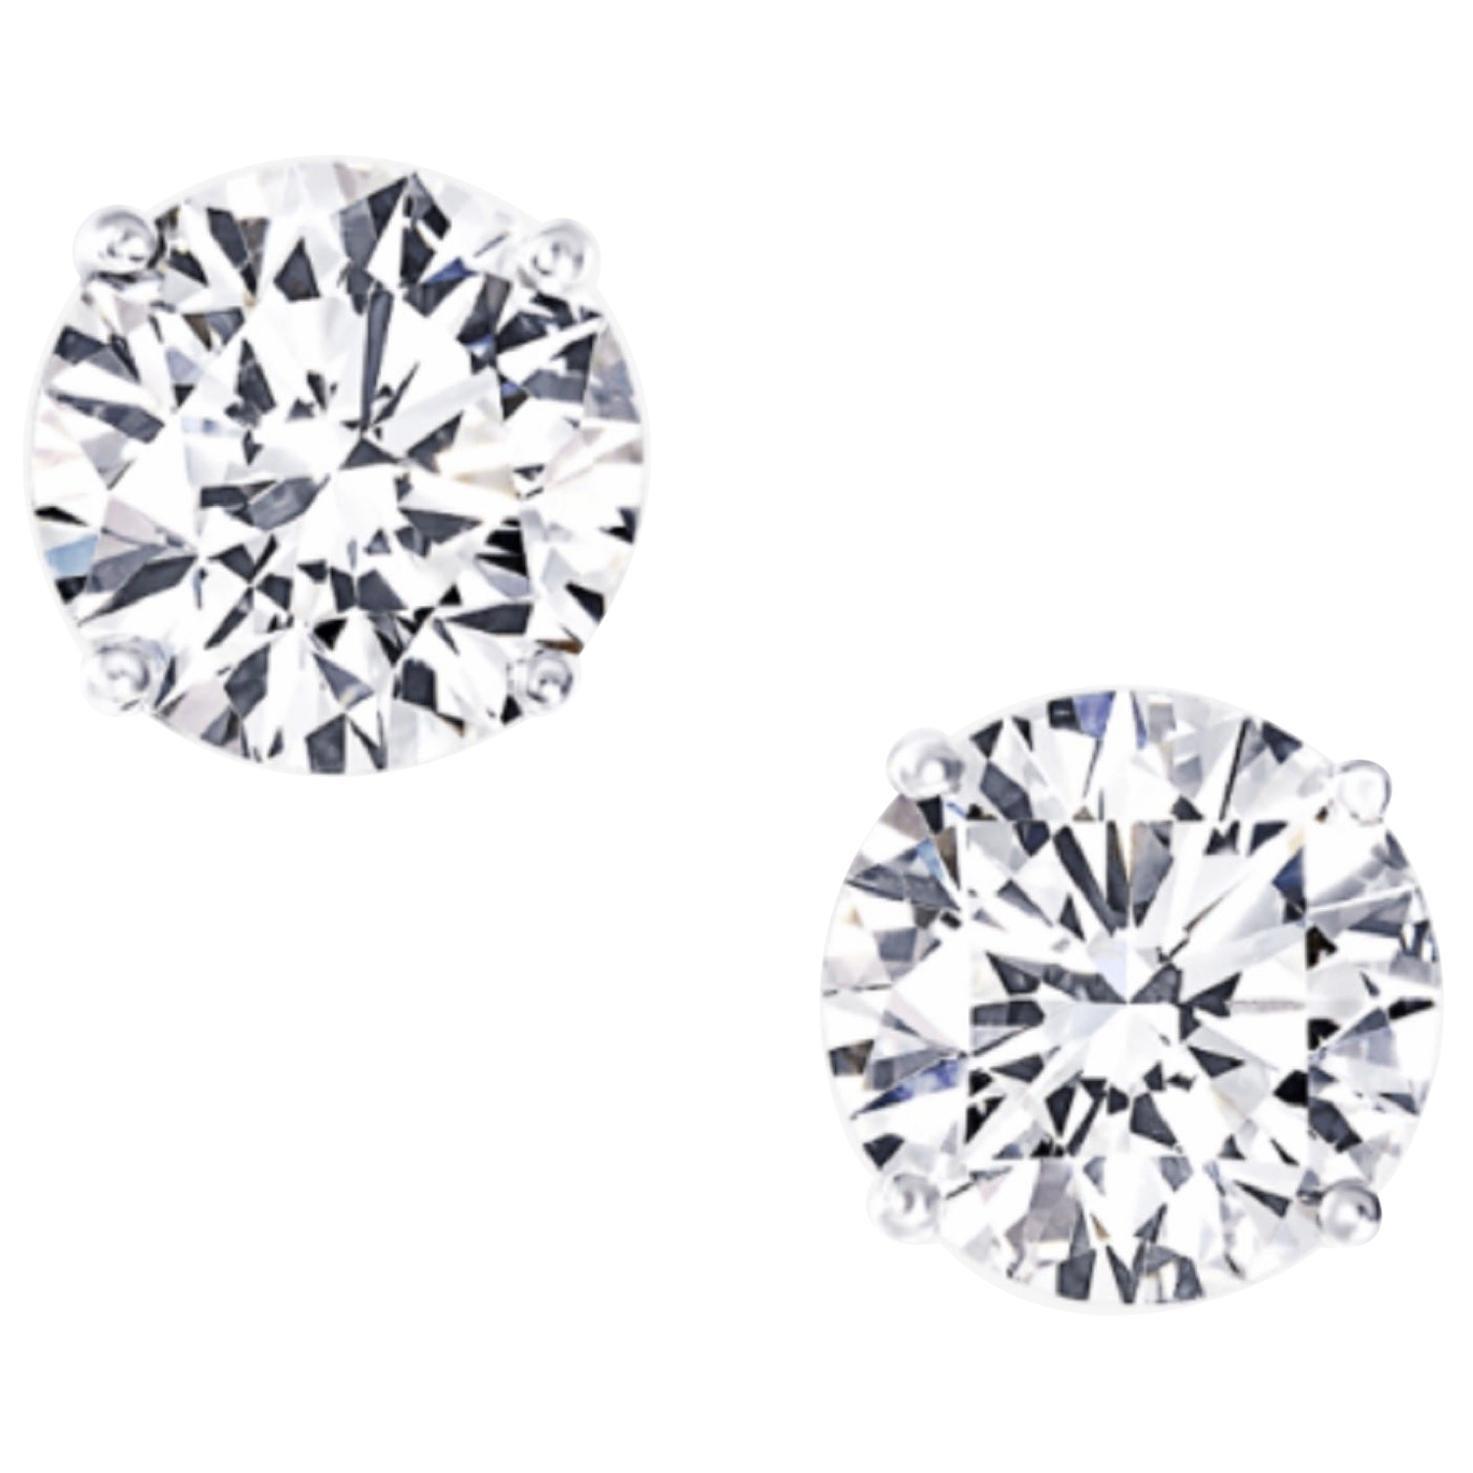 Internally Flawless D/E Color GIA Certified 1.85 Carat Diamond Studs